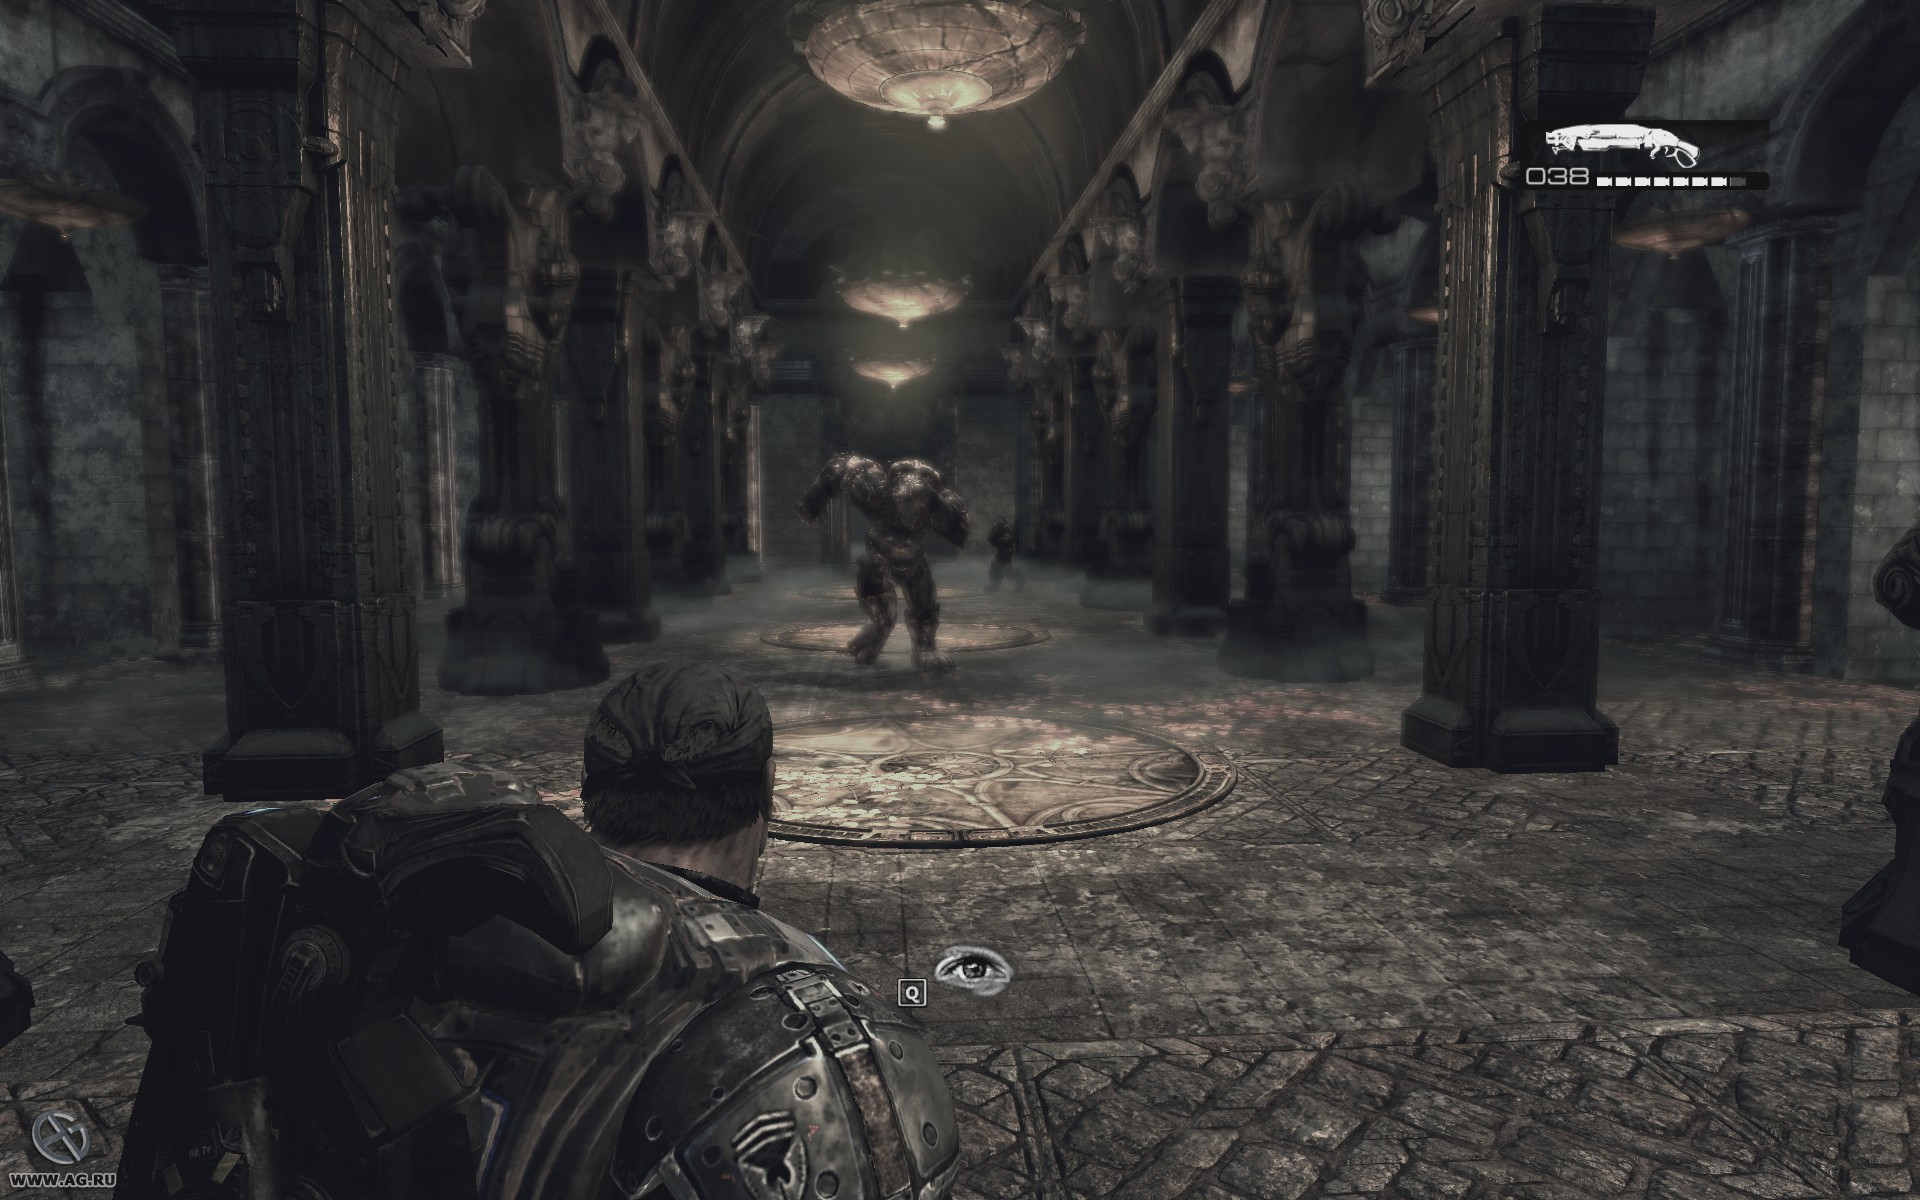 Gears of War (2007) PC | Repack by MOP030B